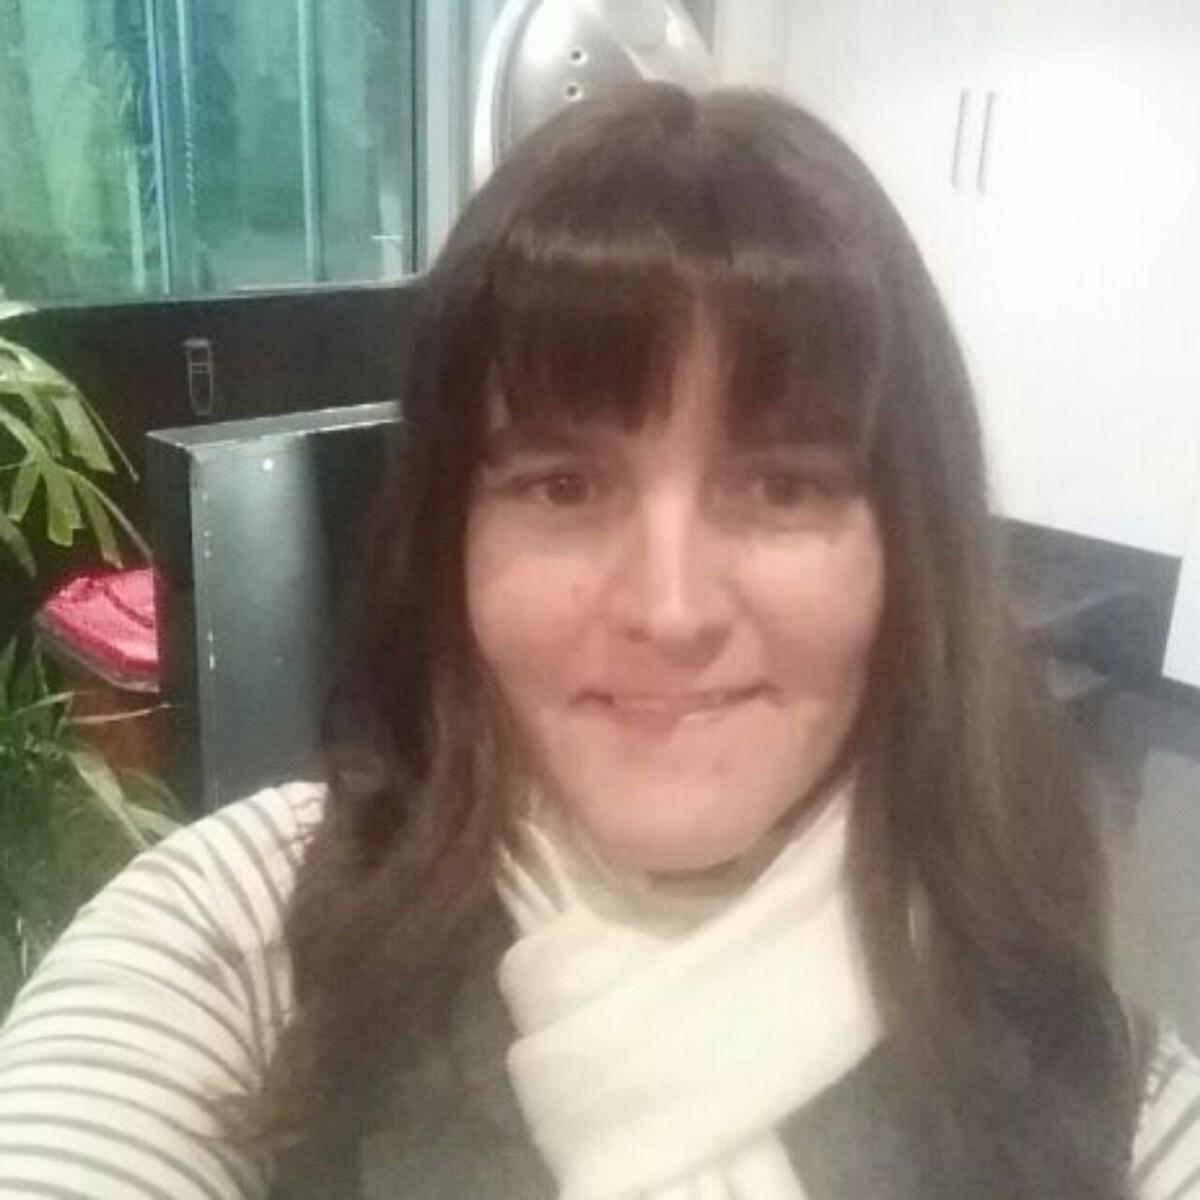 Carly From Rockingham, Australia